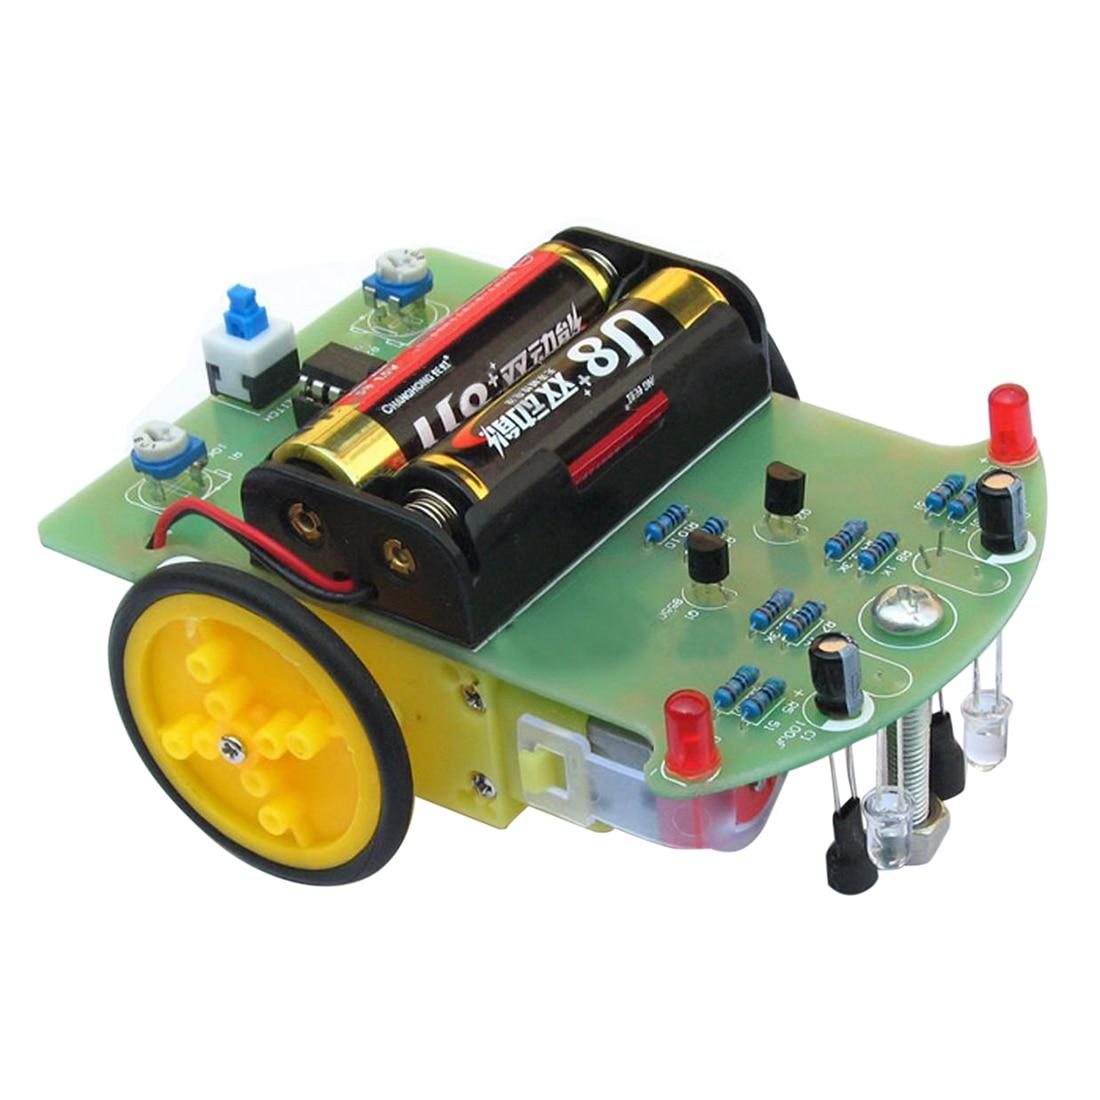 все цены на New Module Smart Tracking Robot Car DIY Kit With Reduction Motor Set For Arduino онлайн